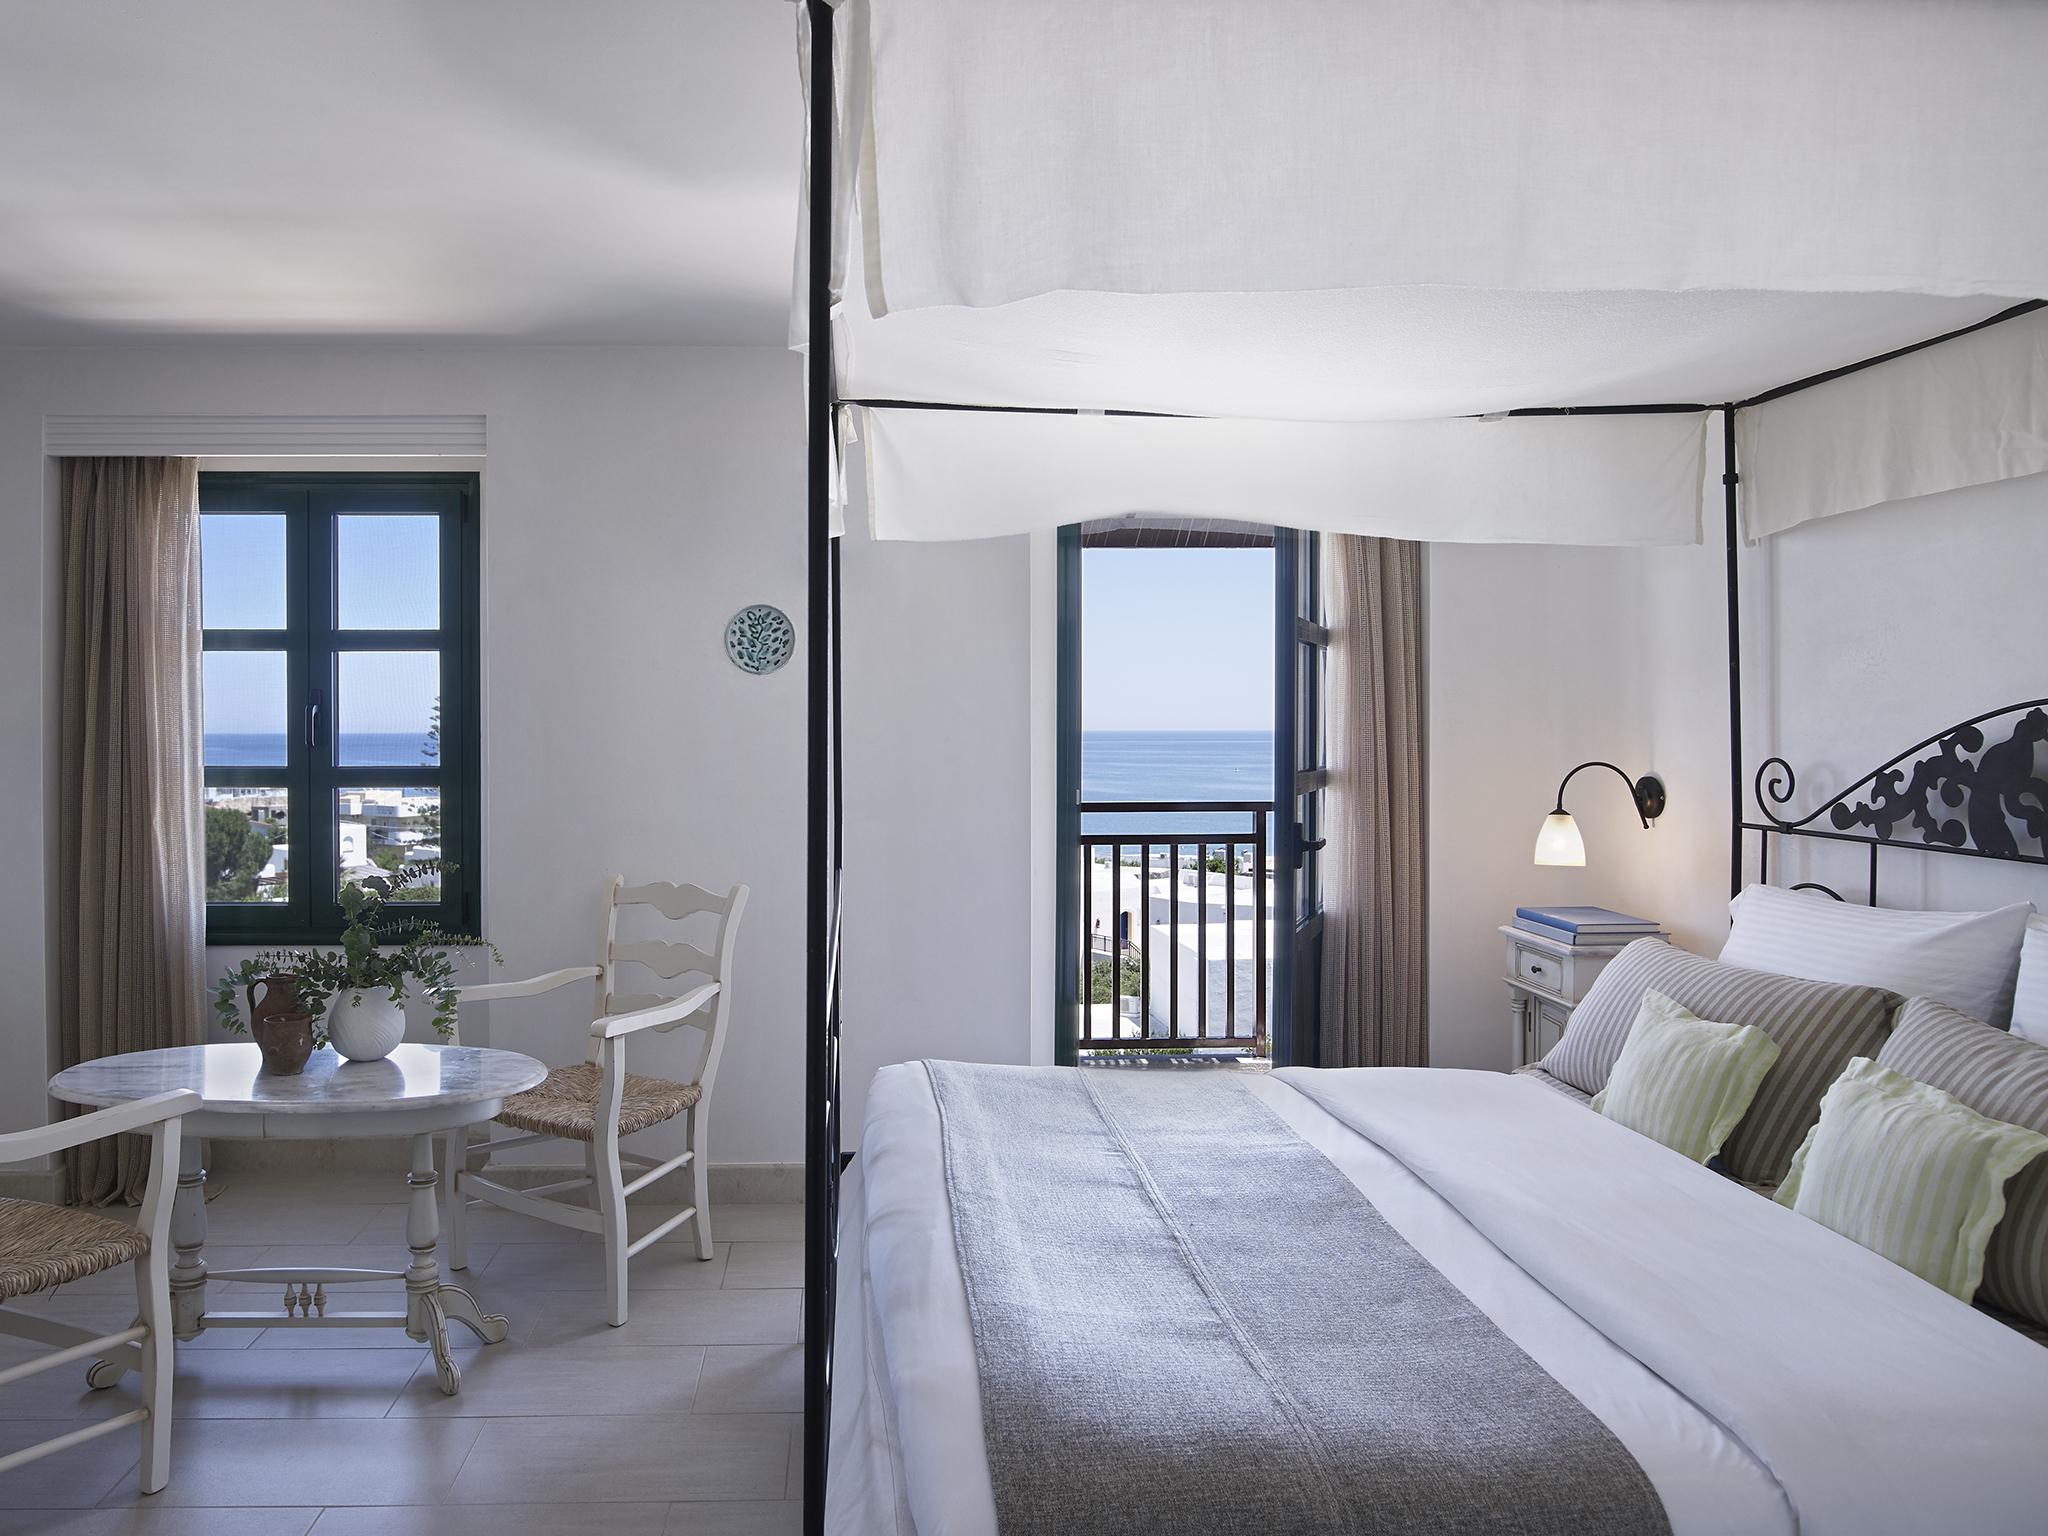 Hotel Creat Maris Beach Resort, Kreta - Collection Suites